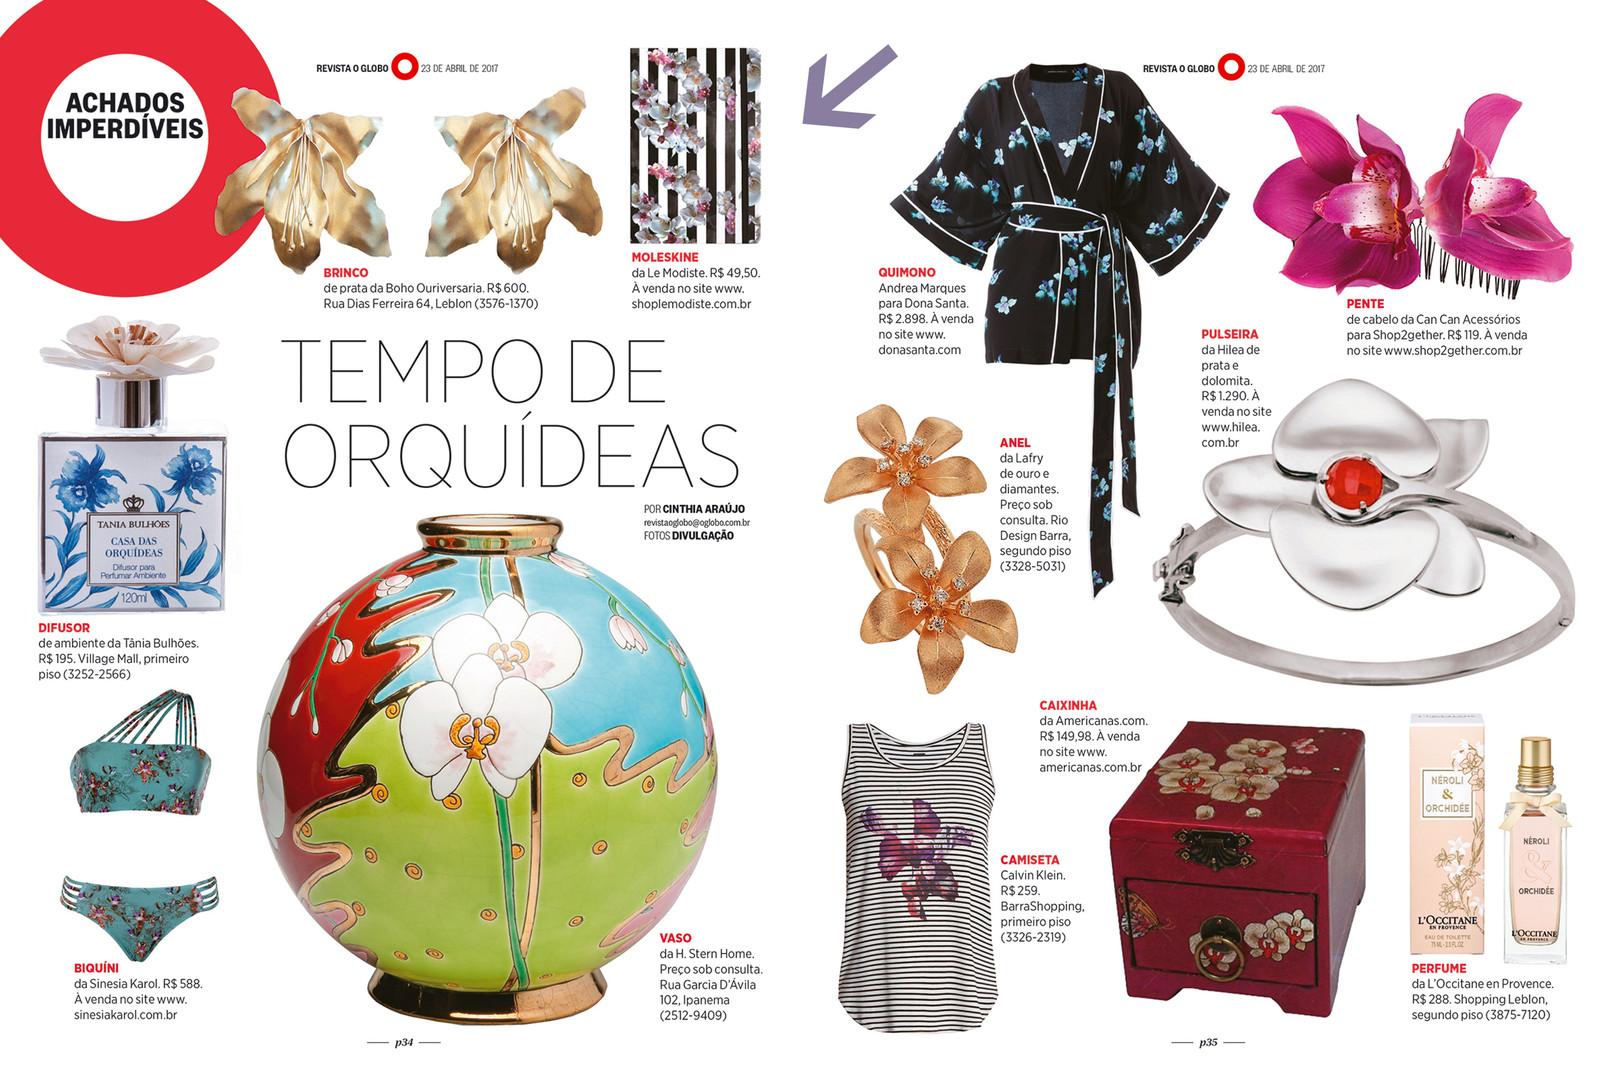 achados revista globo orquideas site nov